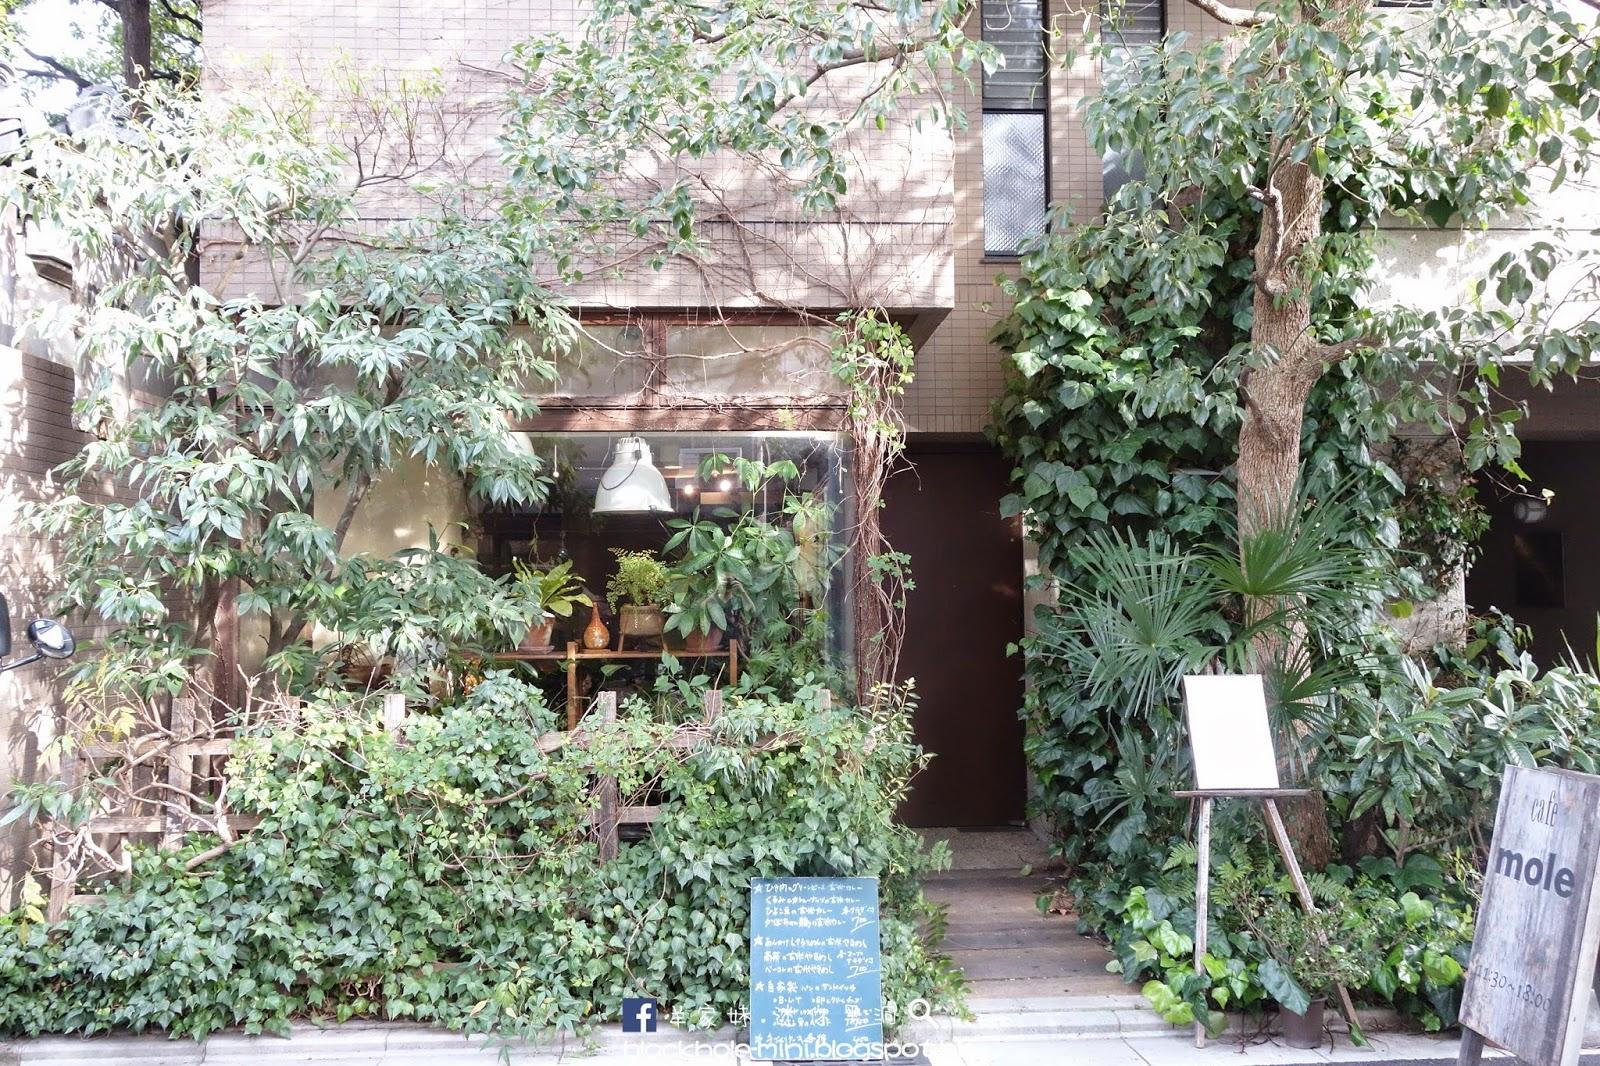 [日本.京都] 被花草包圍的咖啡店:カフェモールMOLE